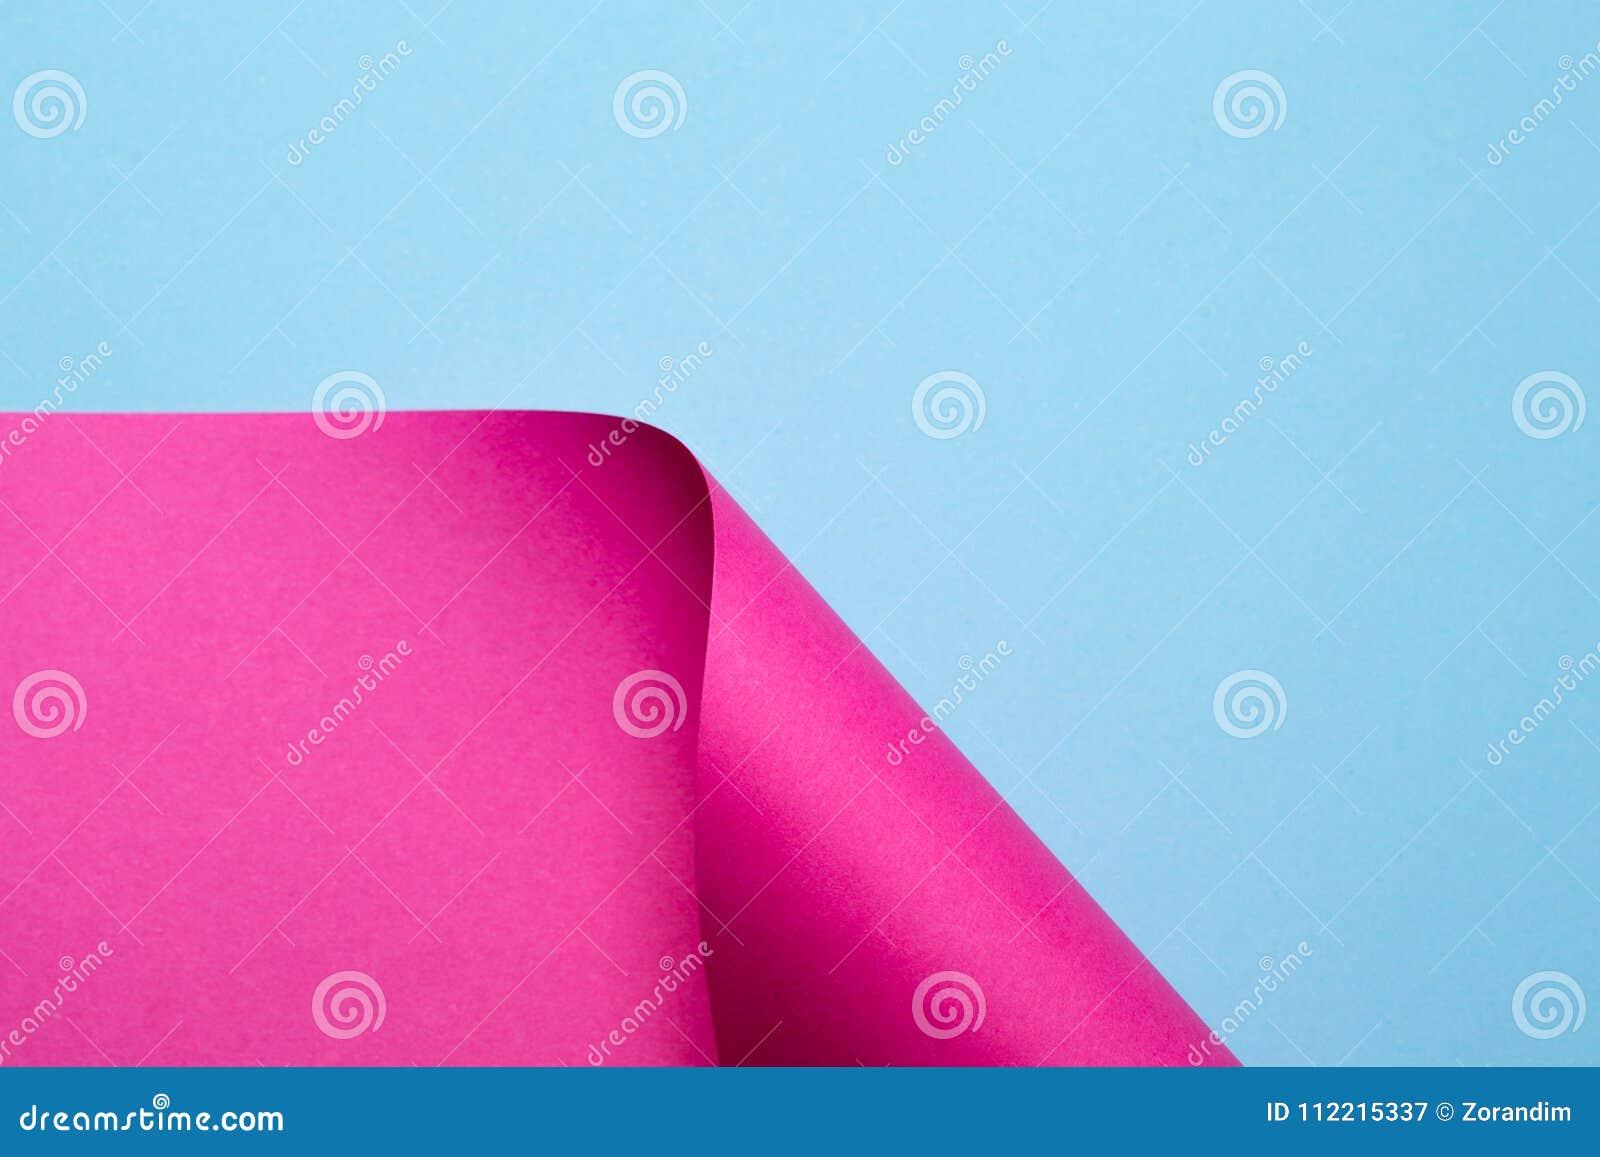 Abstraktes Farbpapier In Den Geometrischen Formen Stockbild - Bild ...